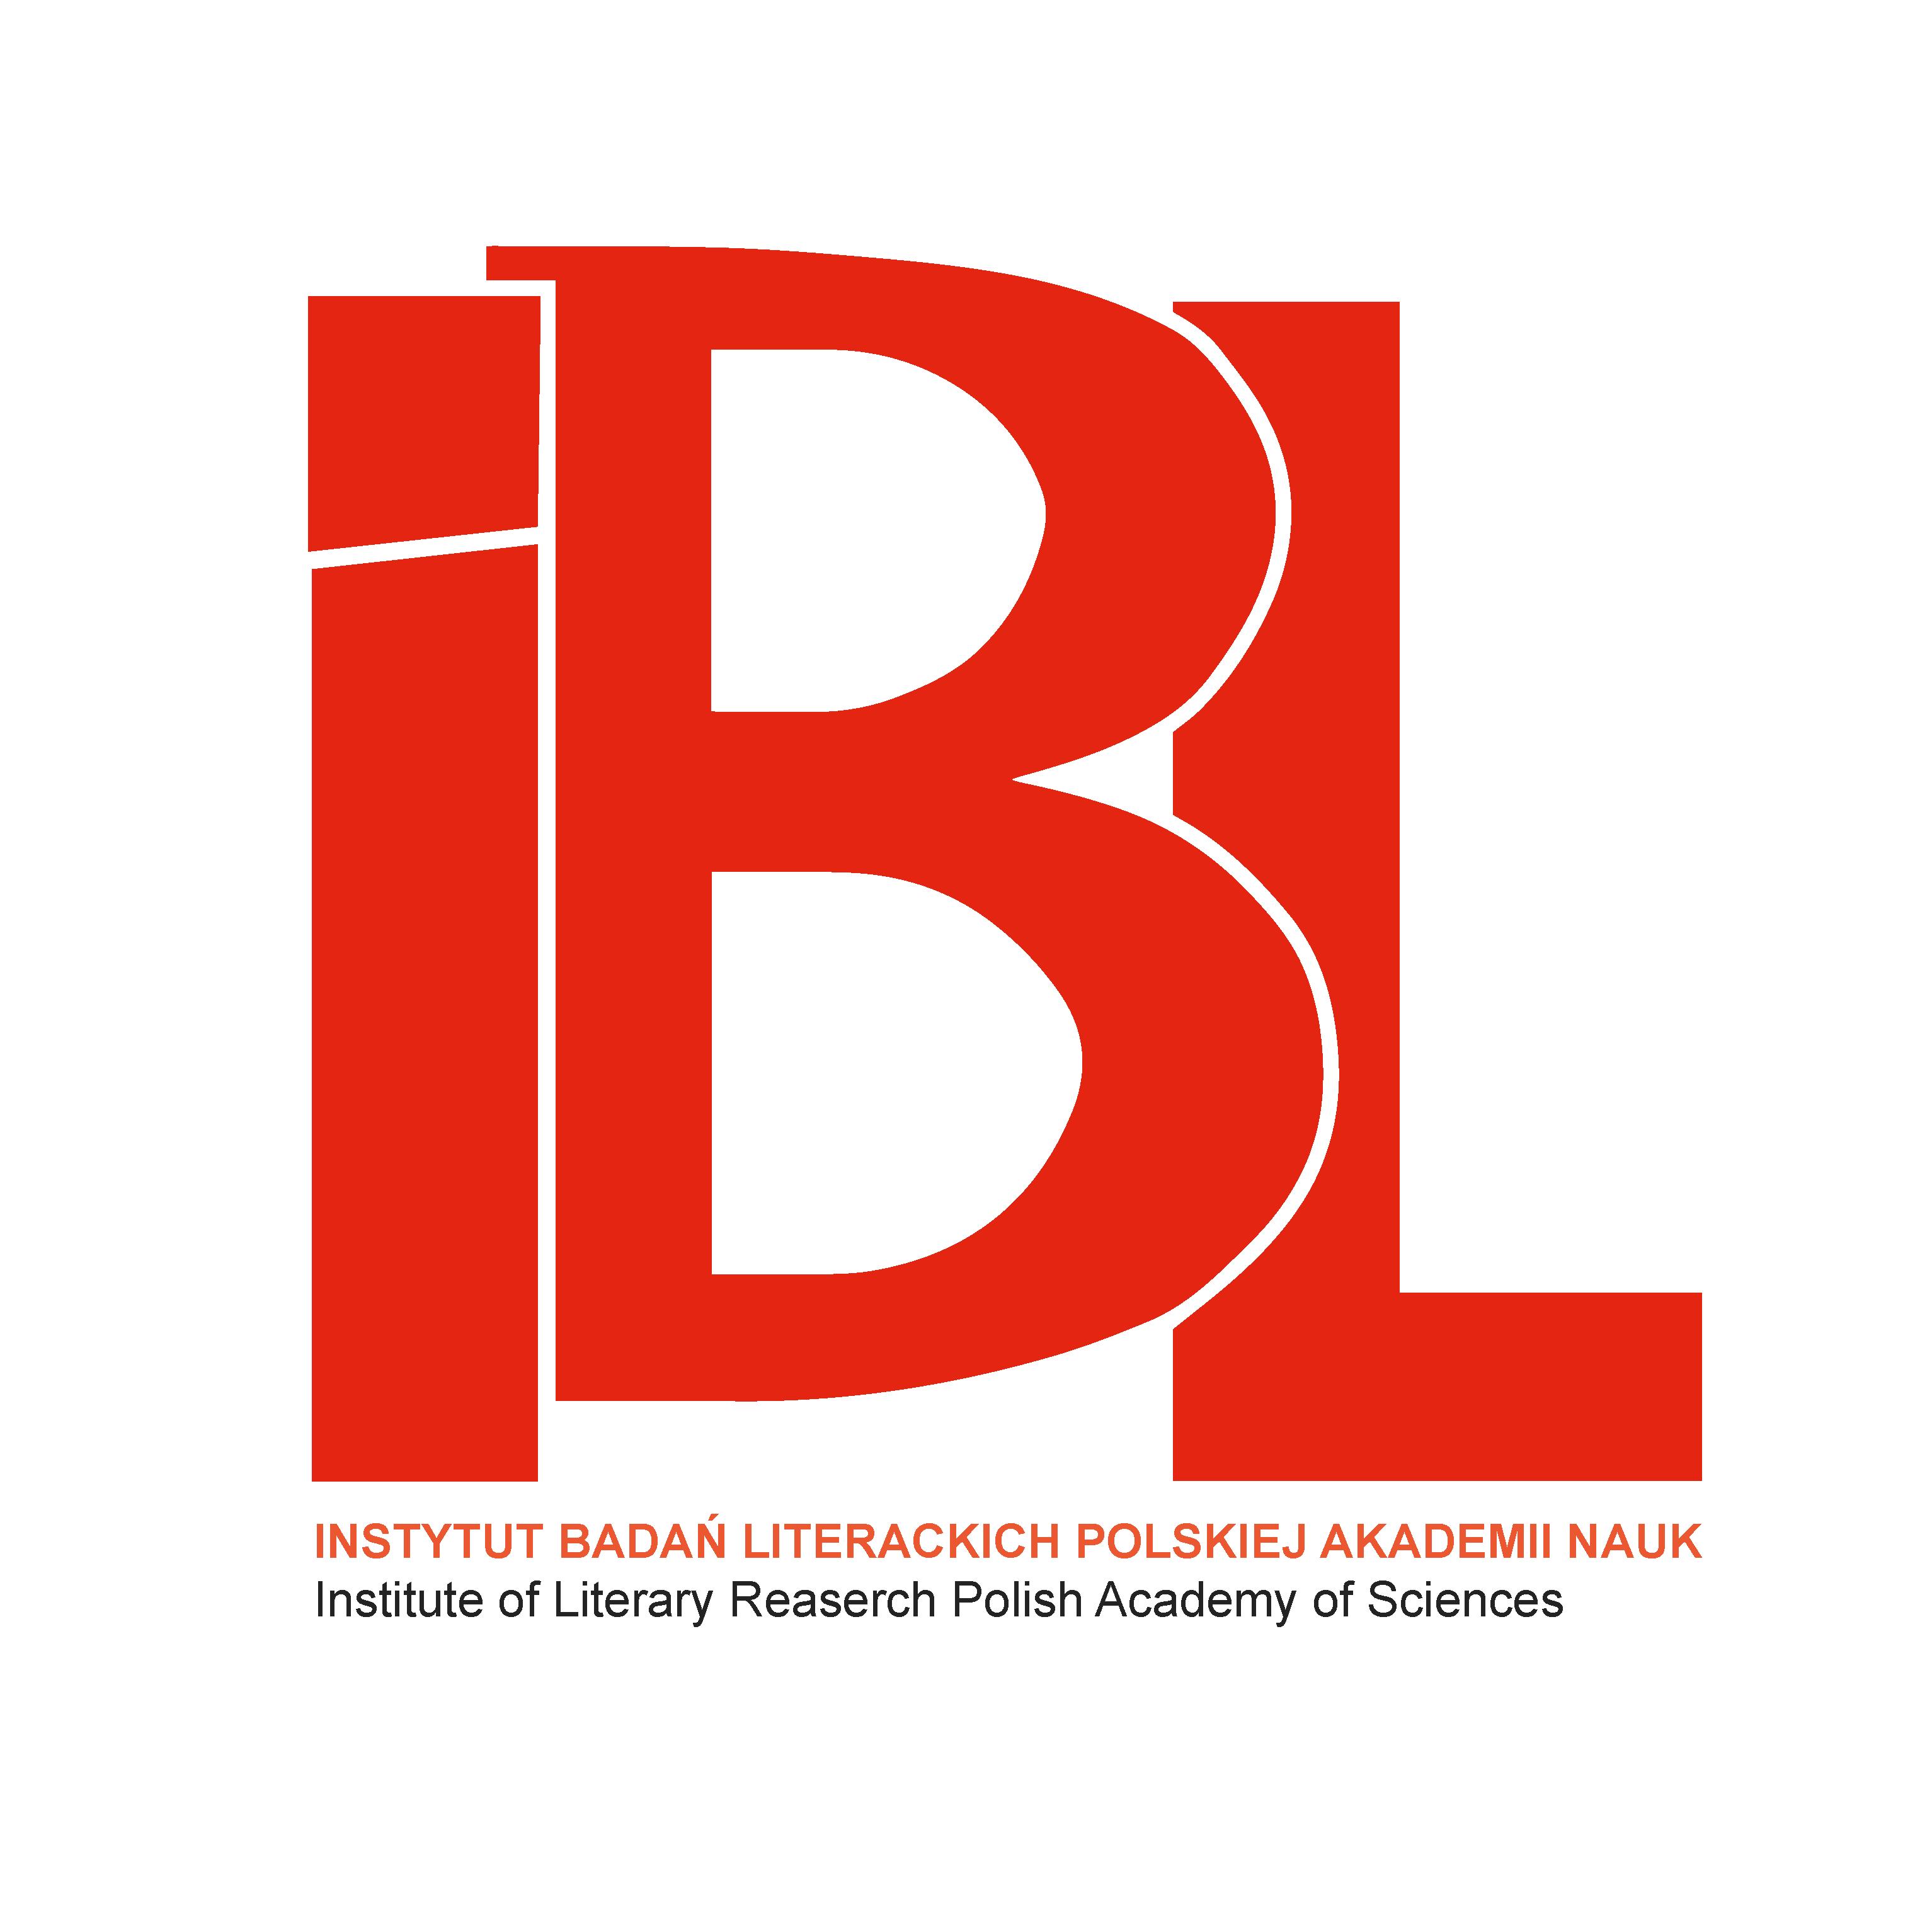 Instytut Badań Literackich, Polska Akademia Nauk